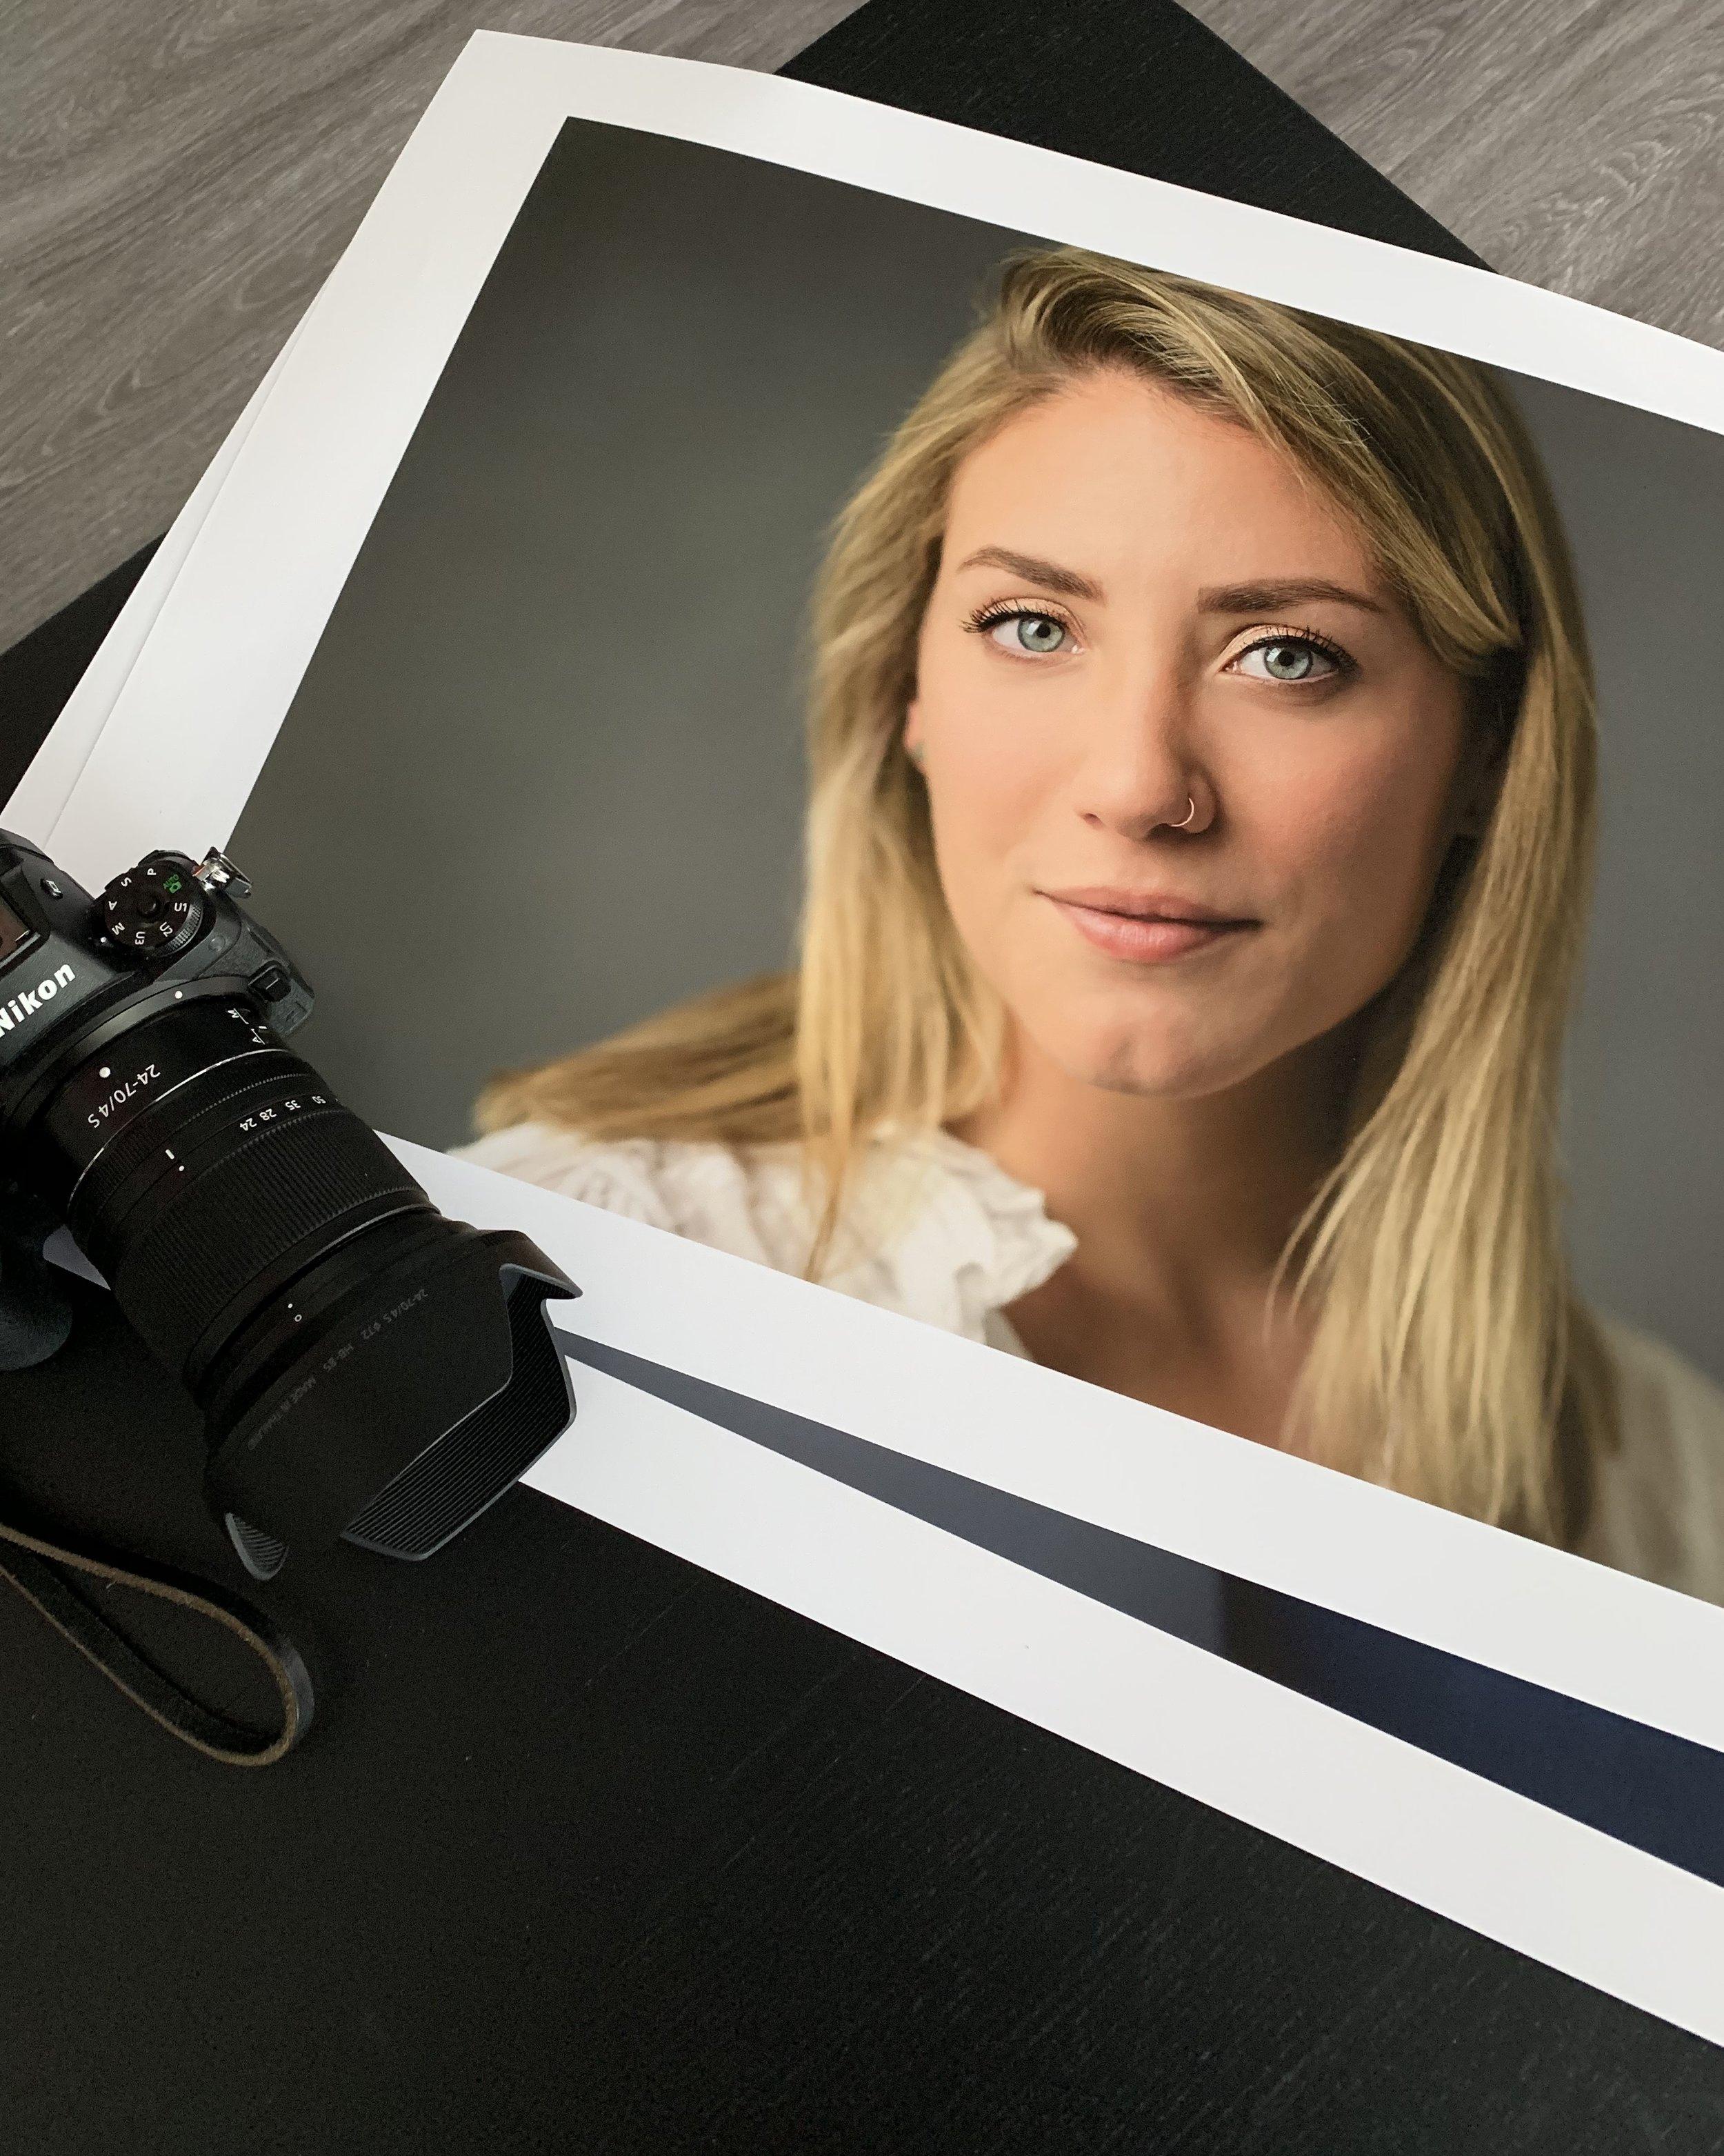 actor-headshot-print.jpg